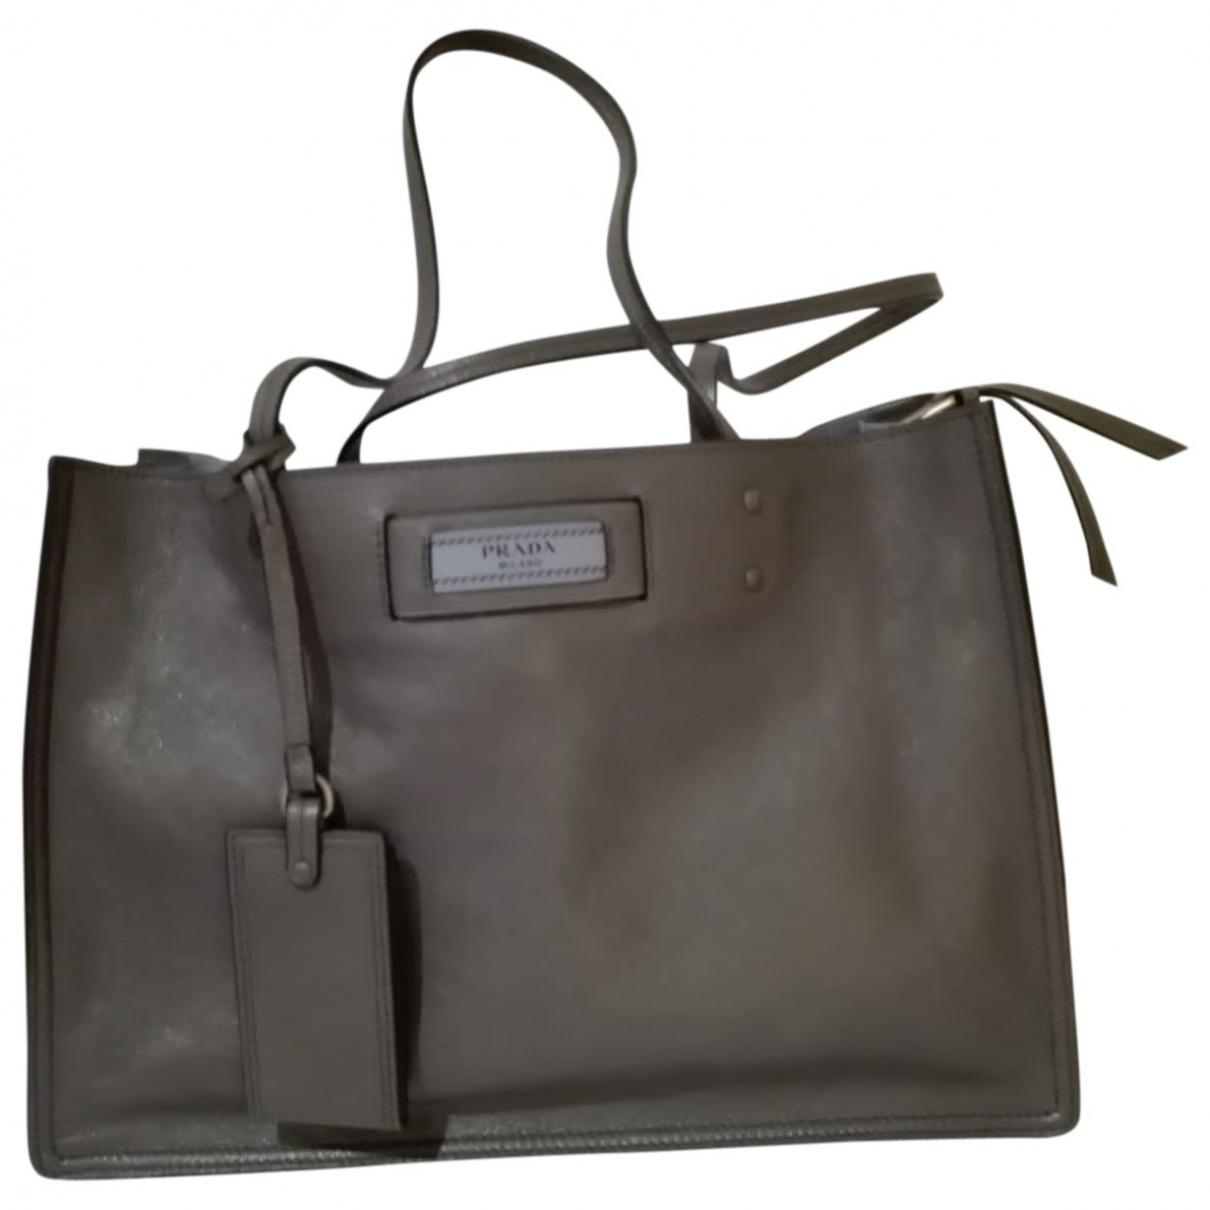 Prada - Sac a main Etiquette pour femme en cuir - gris